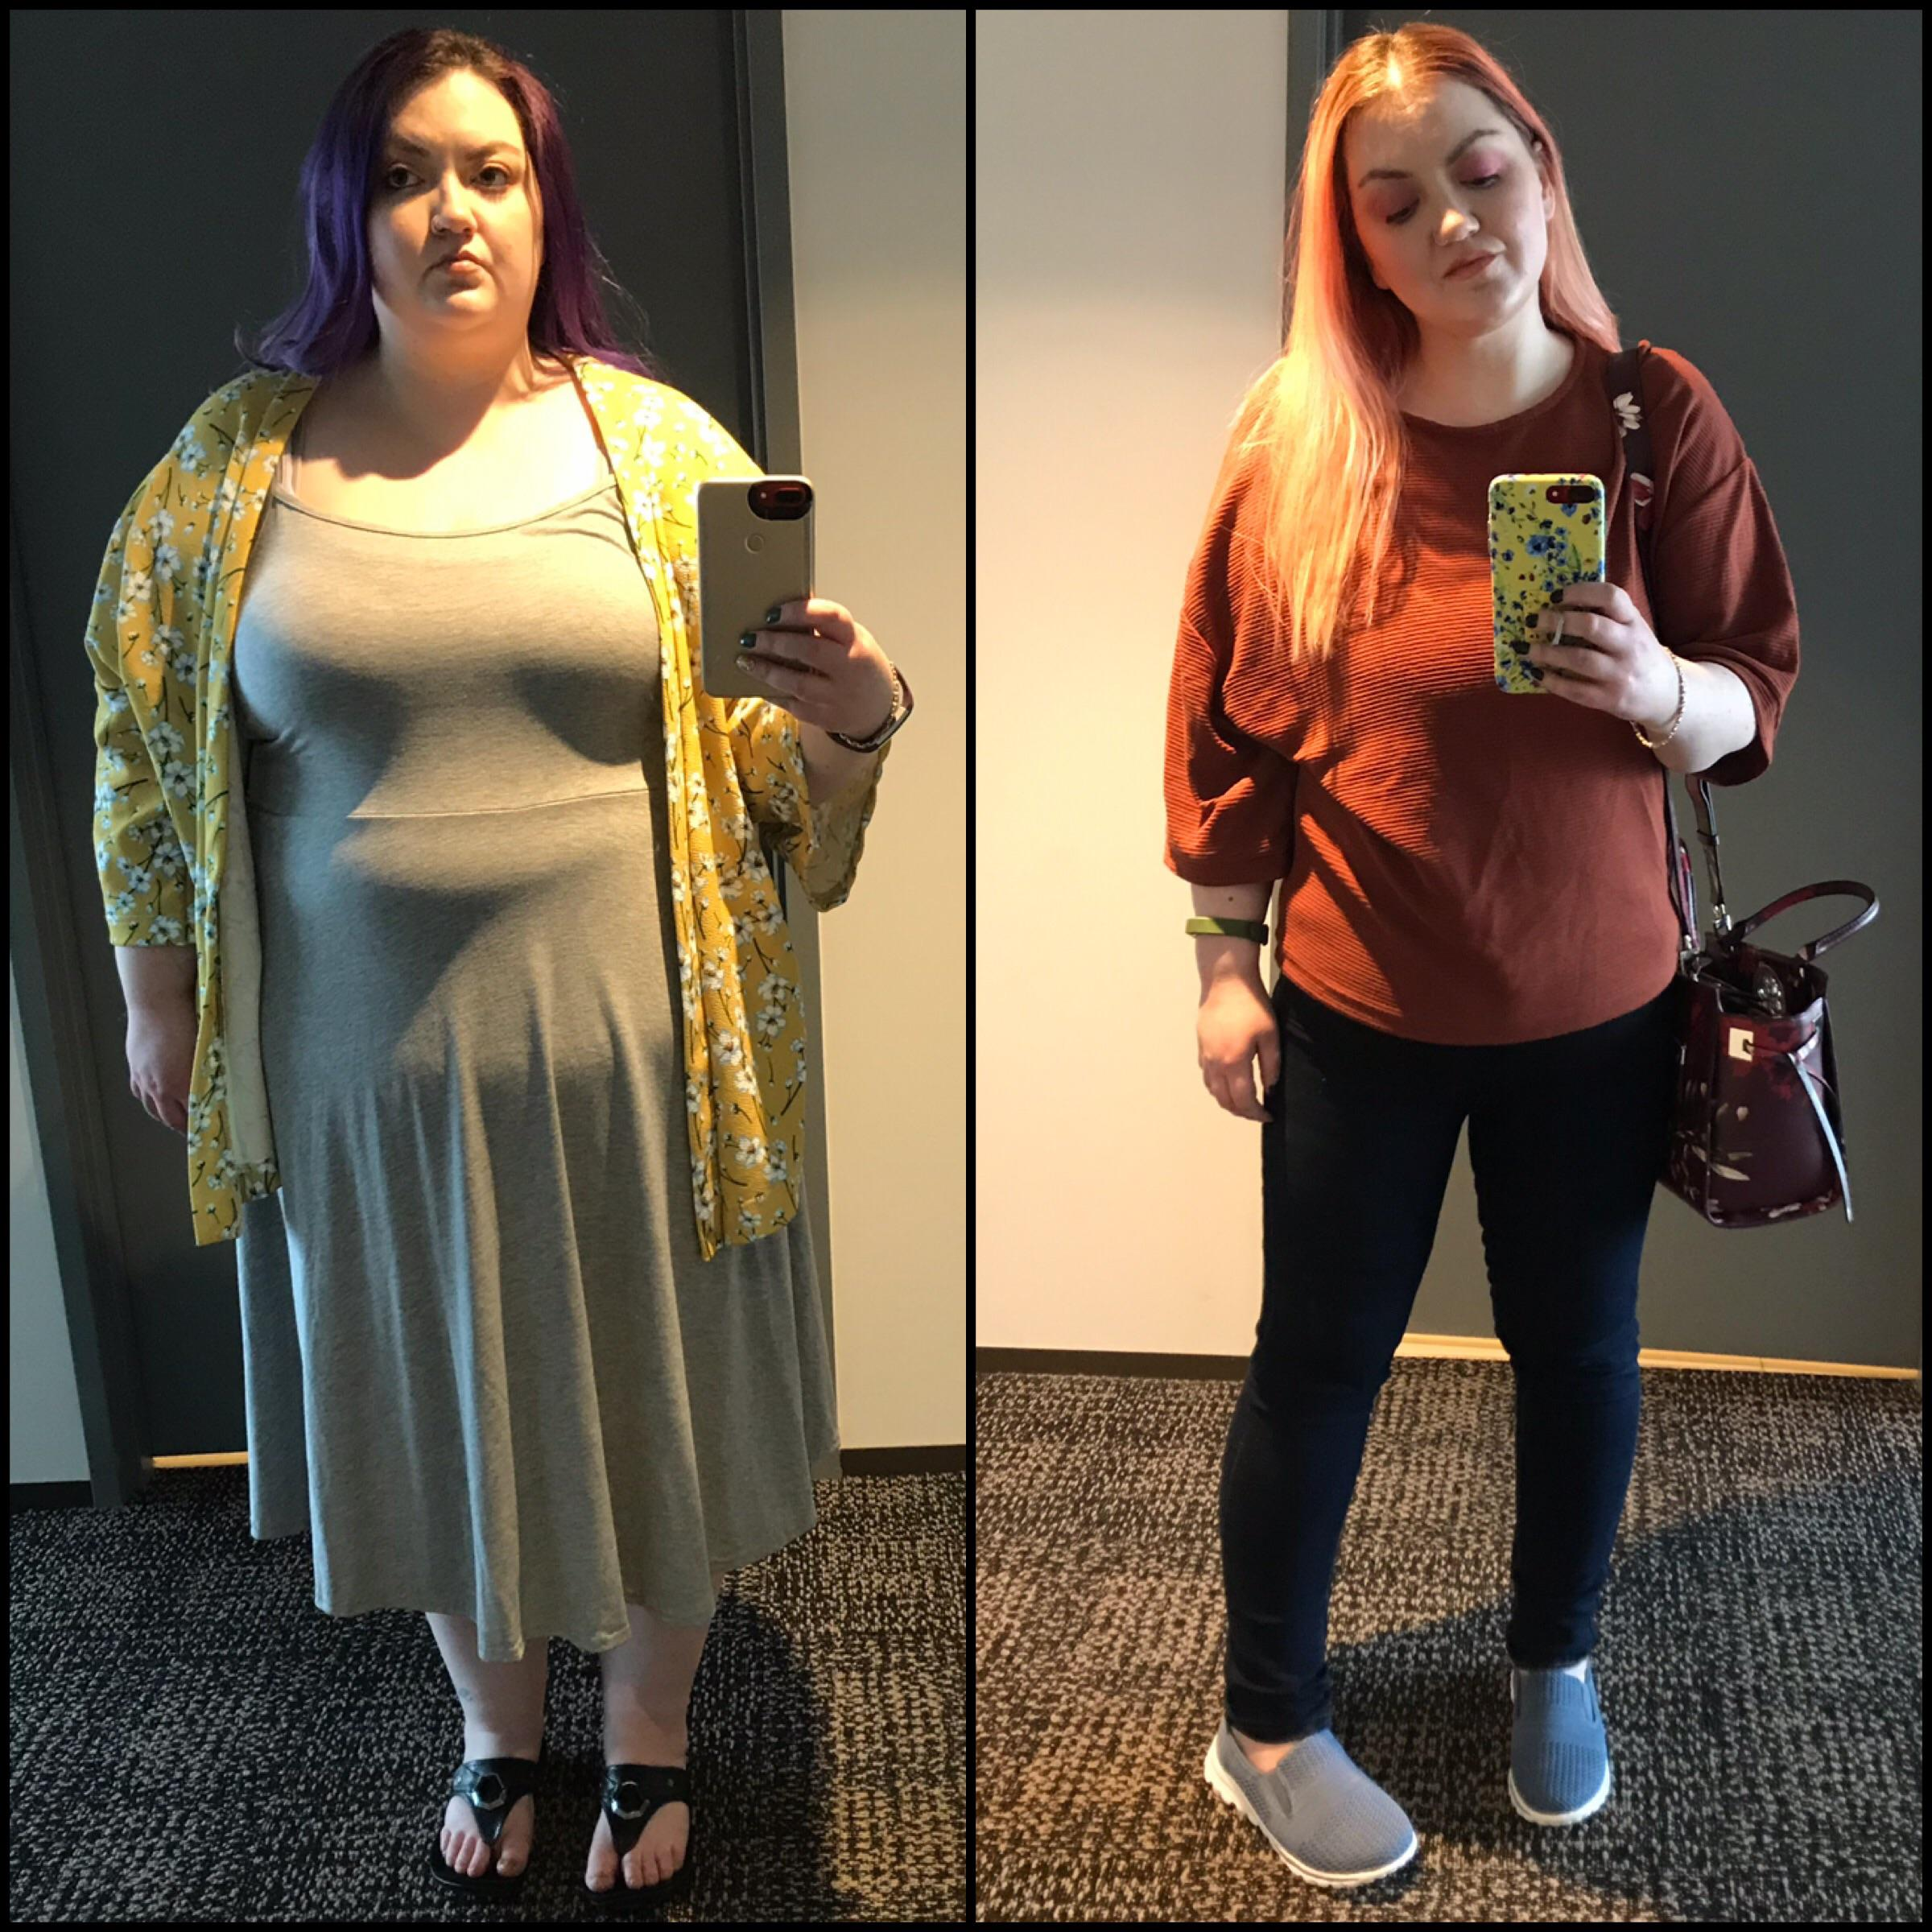 5'4 Female 124 lbs Weight Loss 300 lbs to 176 lbs